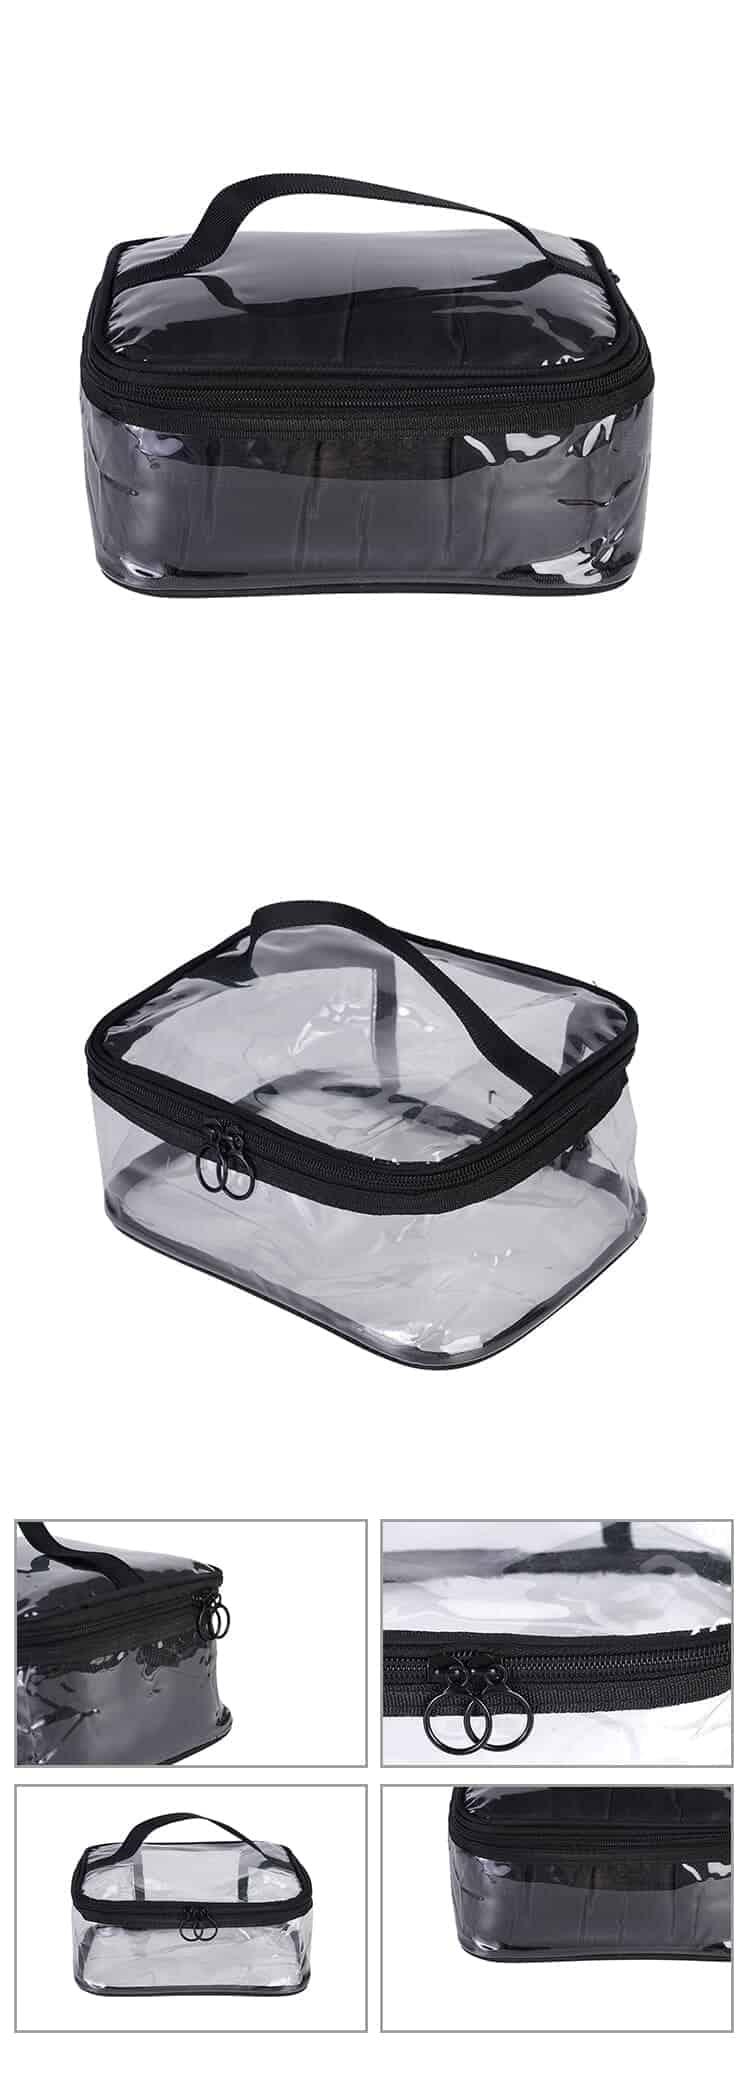 plastic cosmetic bags